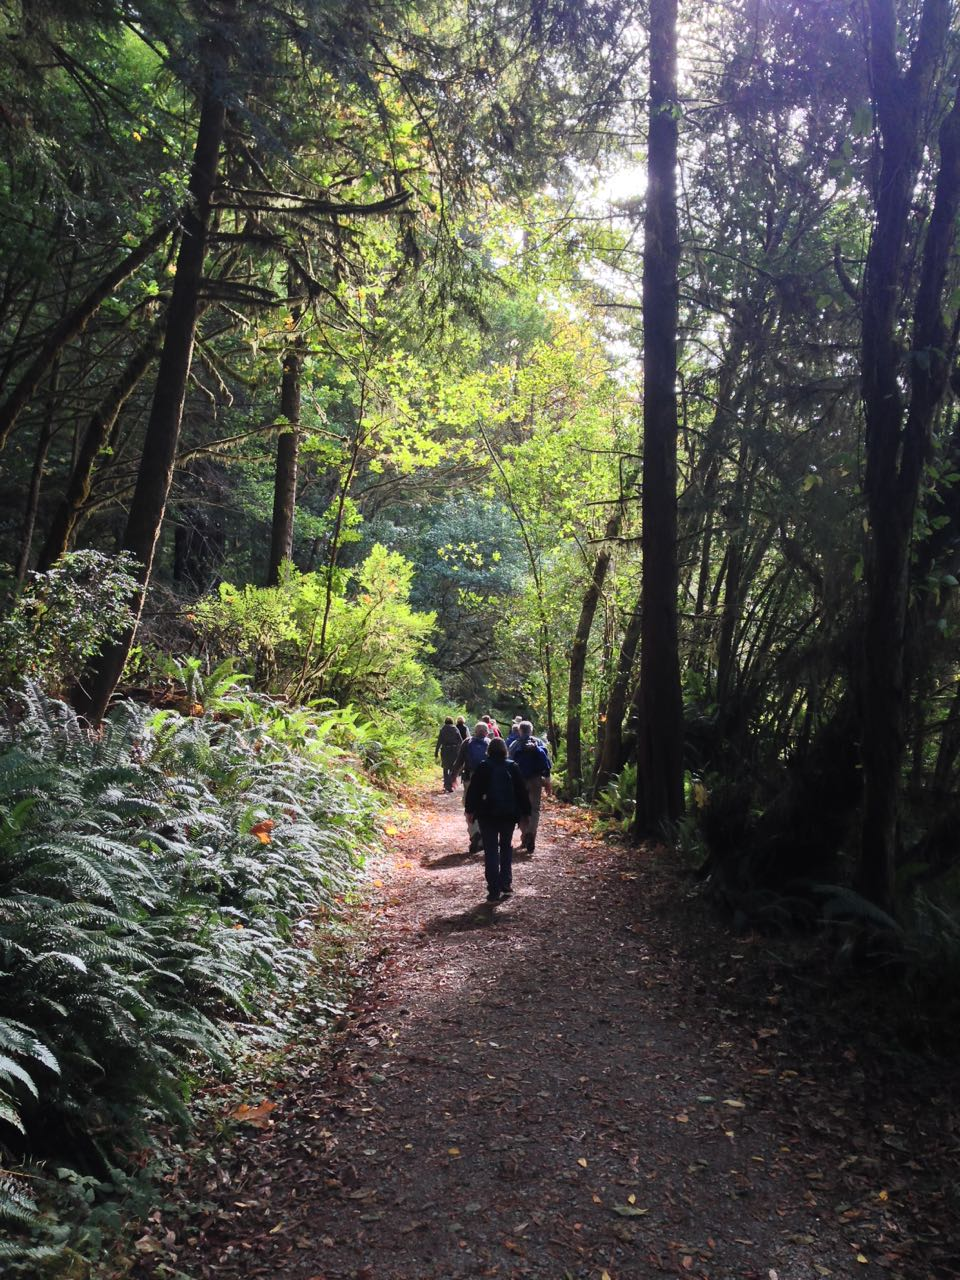 Redwoods 2017 10 08 264 Of 287